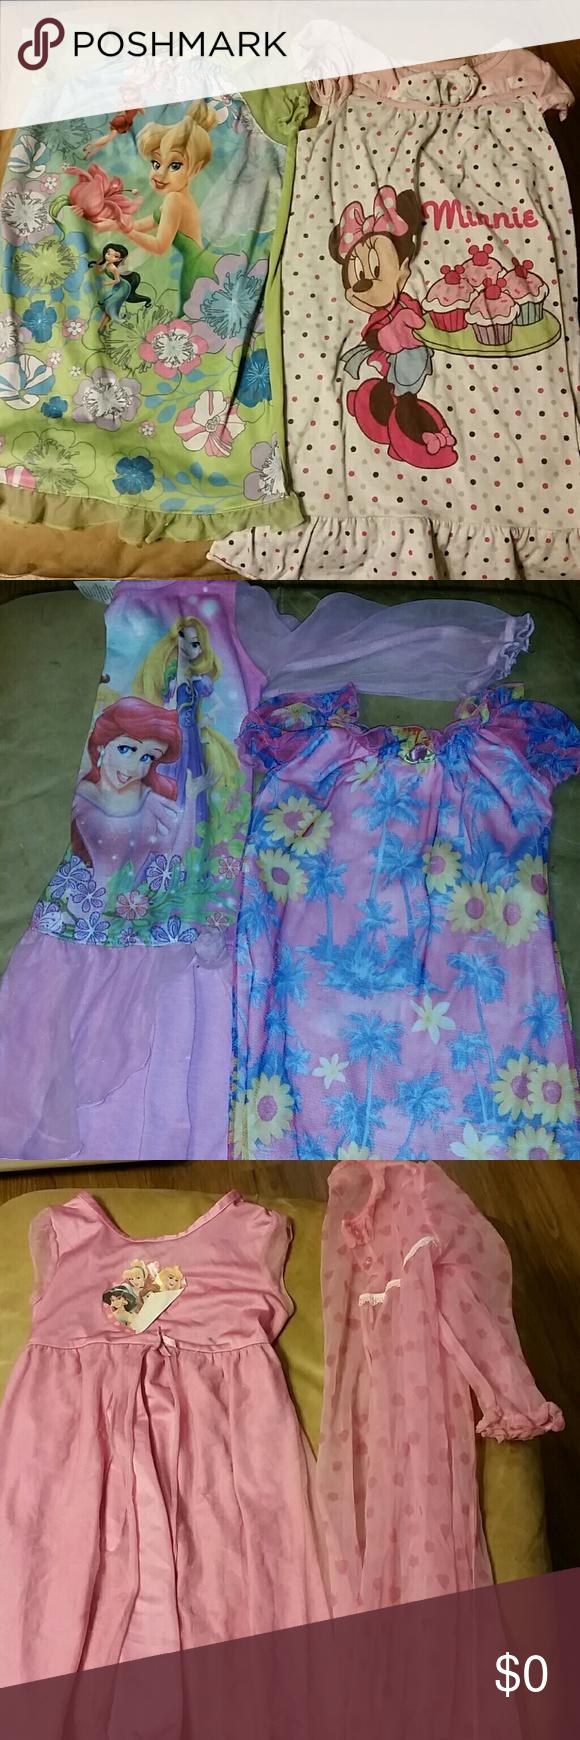 Kids Additinal pics. Disney  pjs Disney Intimates & Sleepwear Pajamas